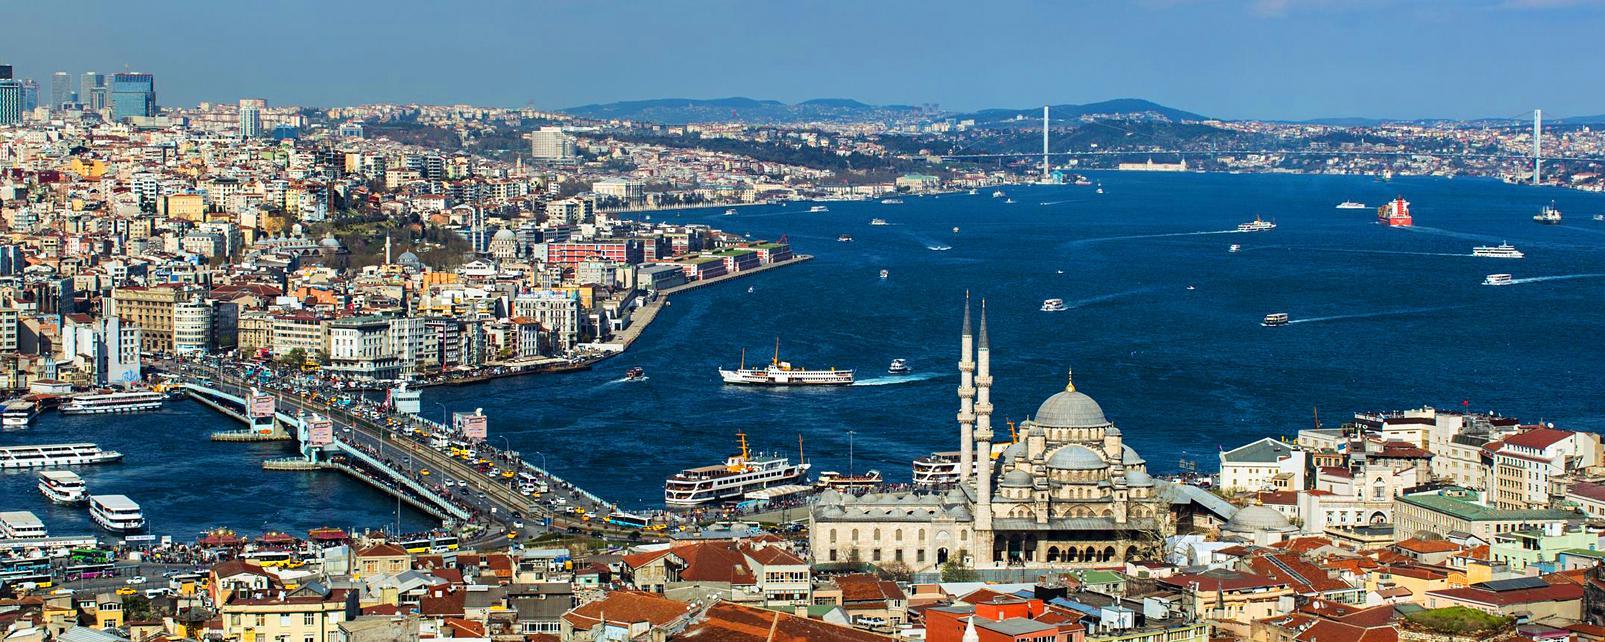 Kaybettikleri İstanbul'u; AKP YİNE KAYBETSE; FELAKET… KAZANIVERSE; FECAAT OLACAKTI